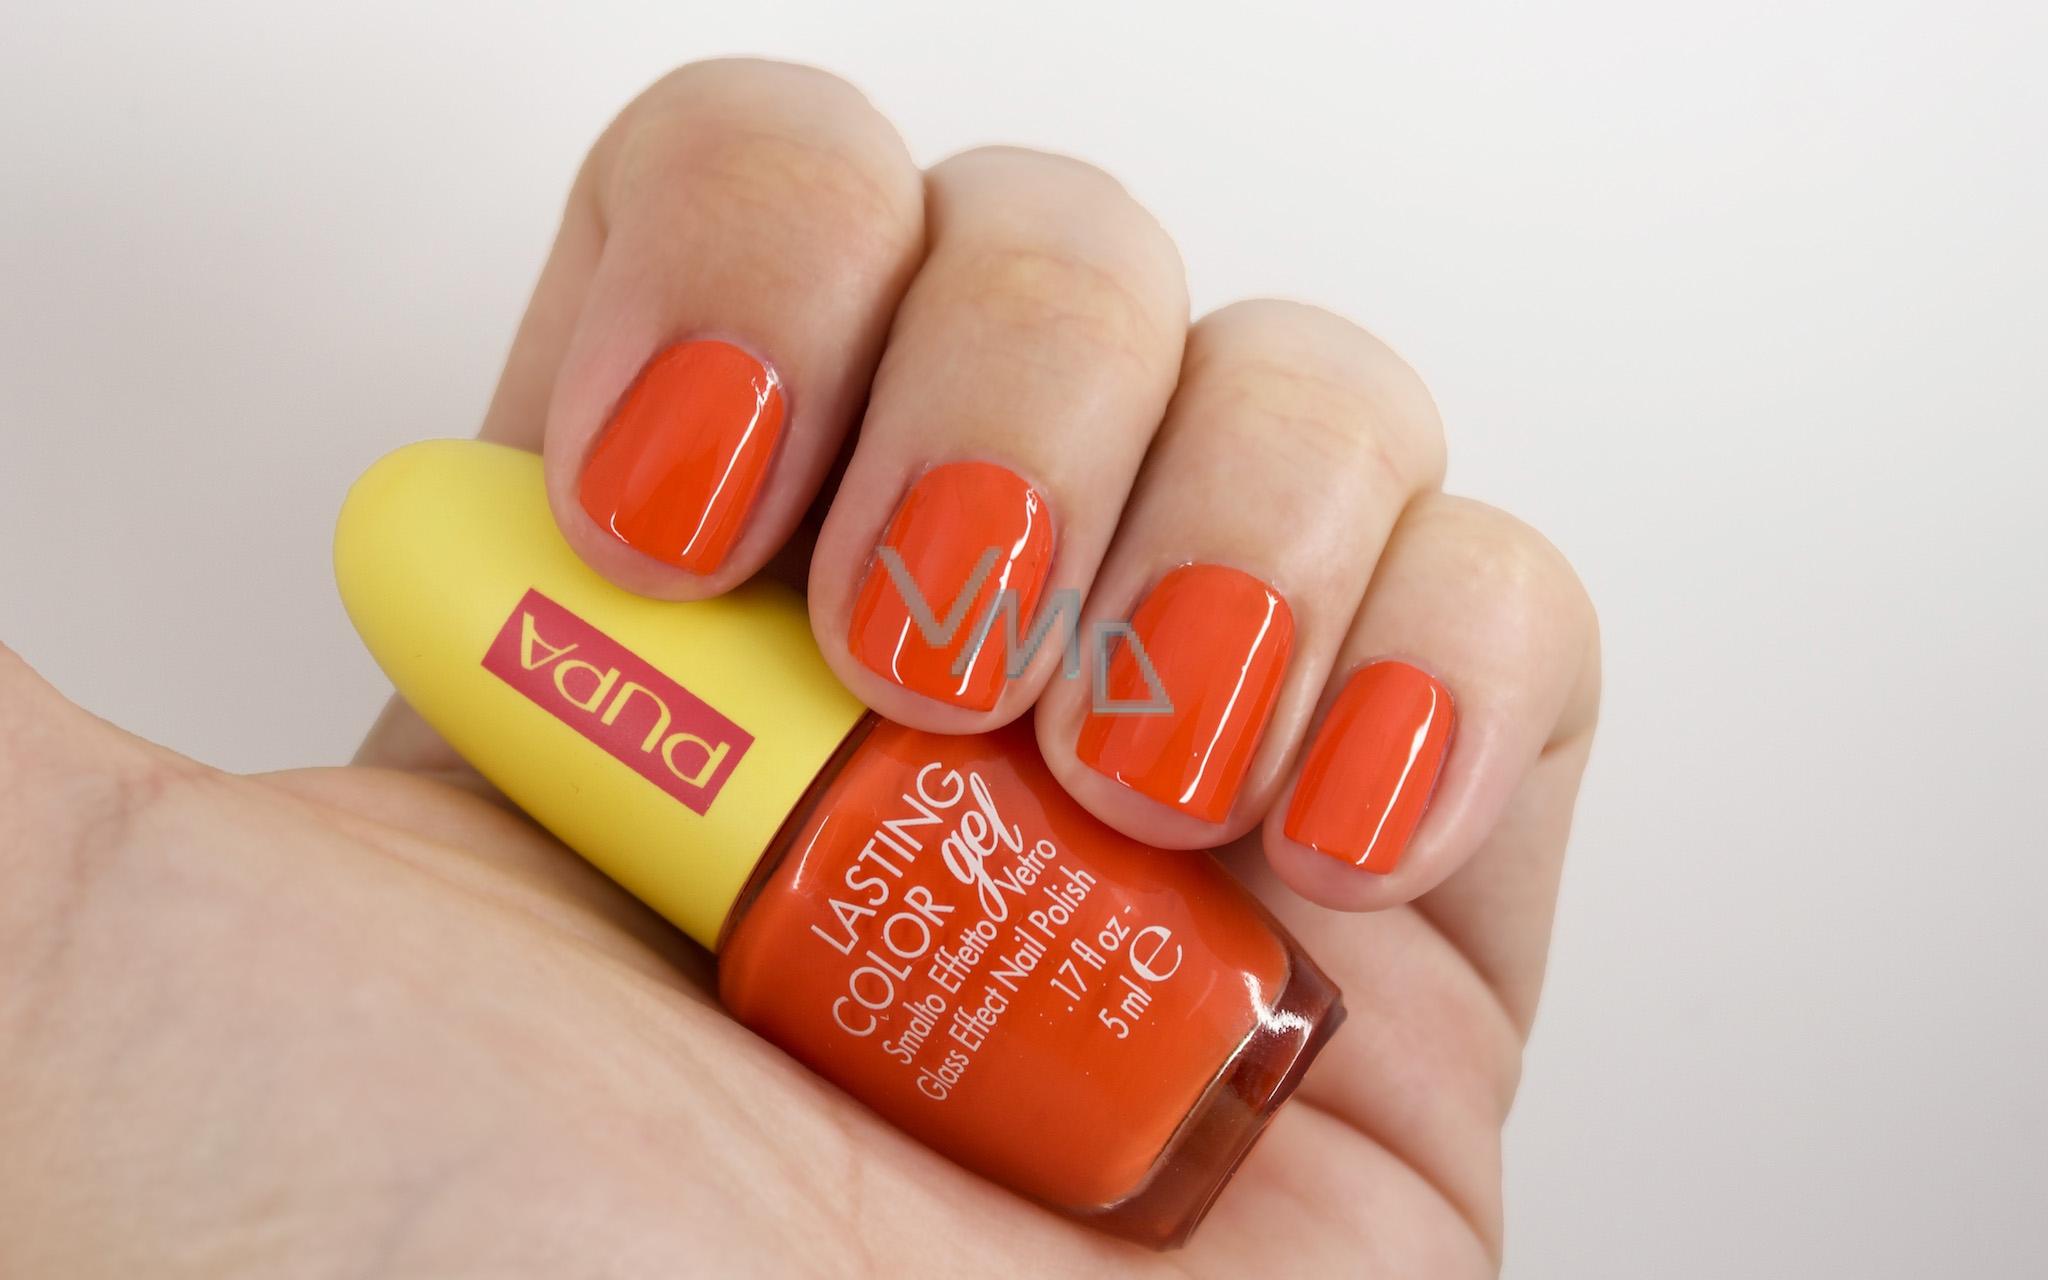 Pupa Summer In La Lasting Color Gel Gel Nail Polish 183 Swett Spritz 5 Ml Vmd Parfumerie Drogerie